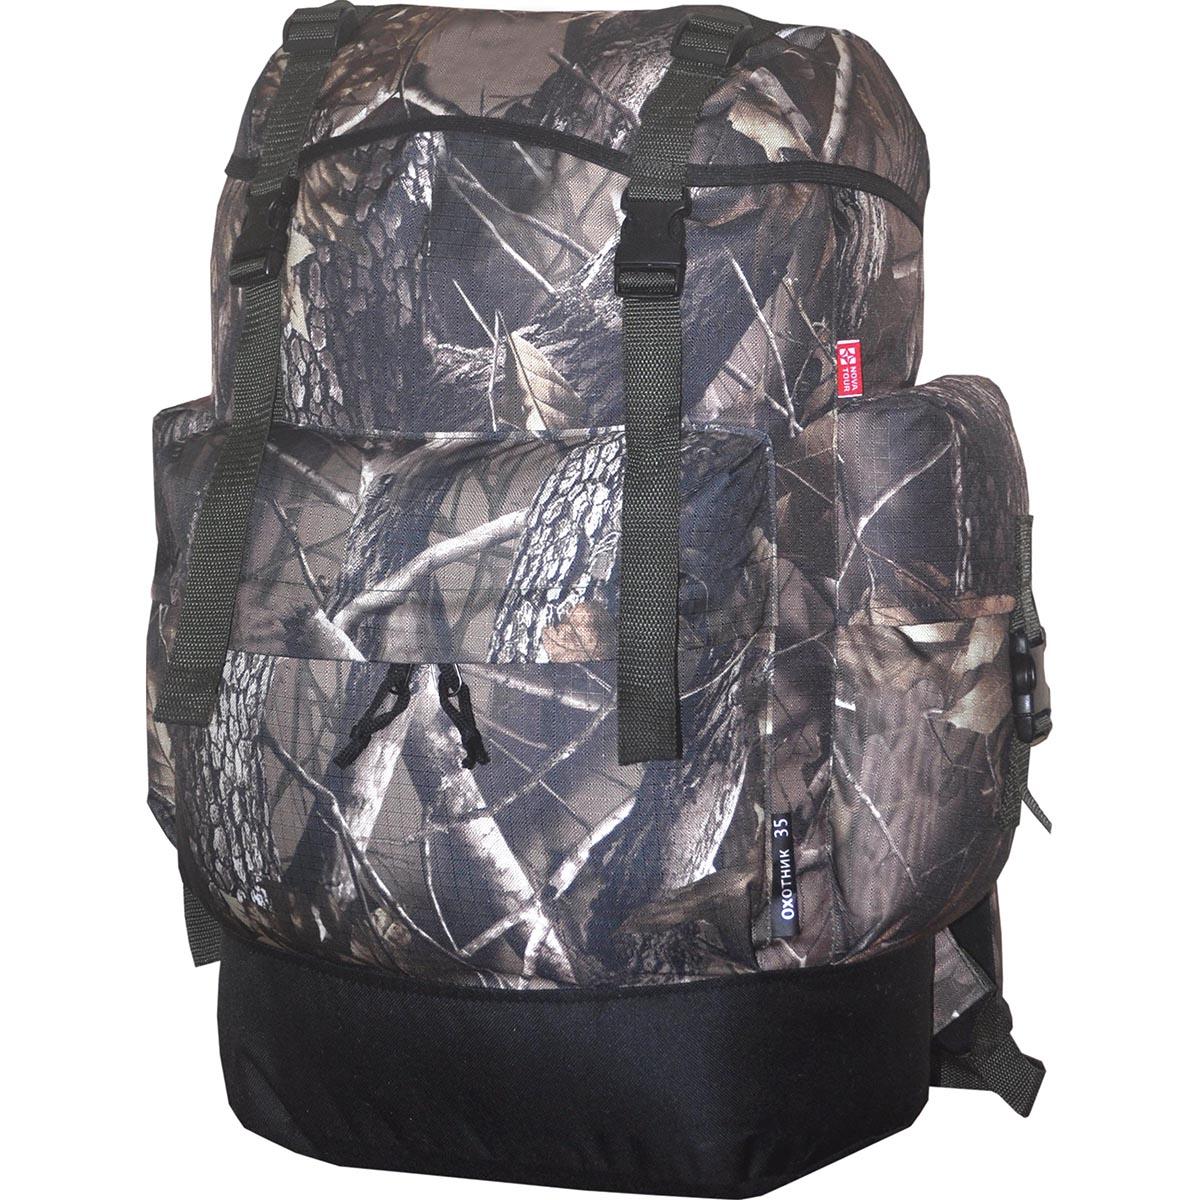 Рюкзак для охоты HunterMan Nova Tour